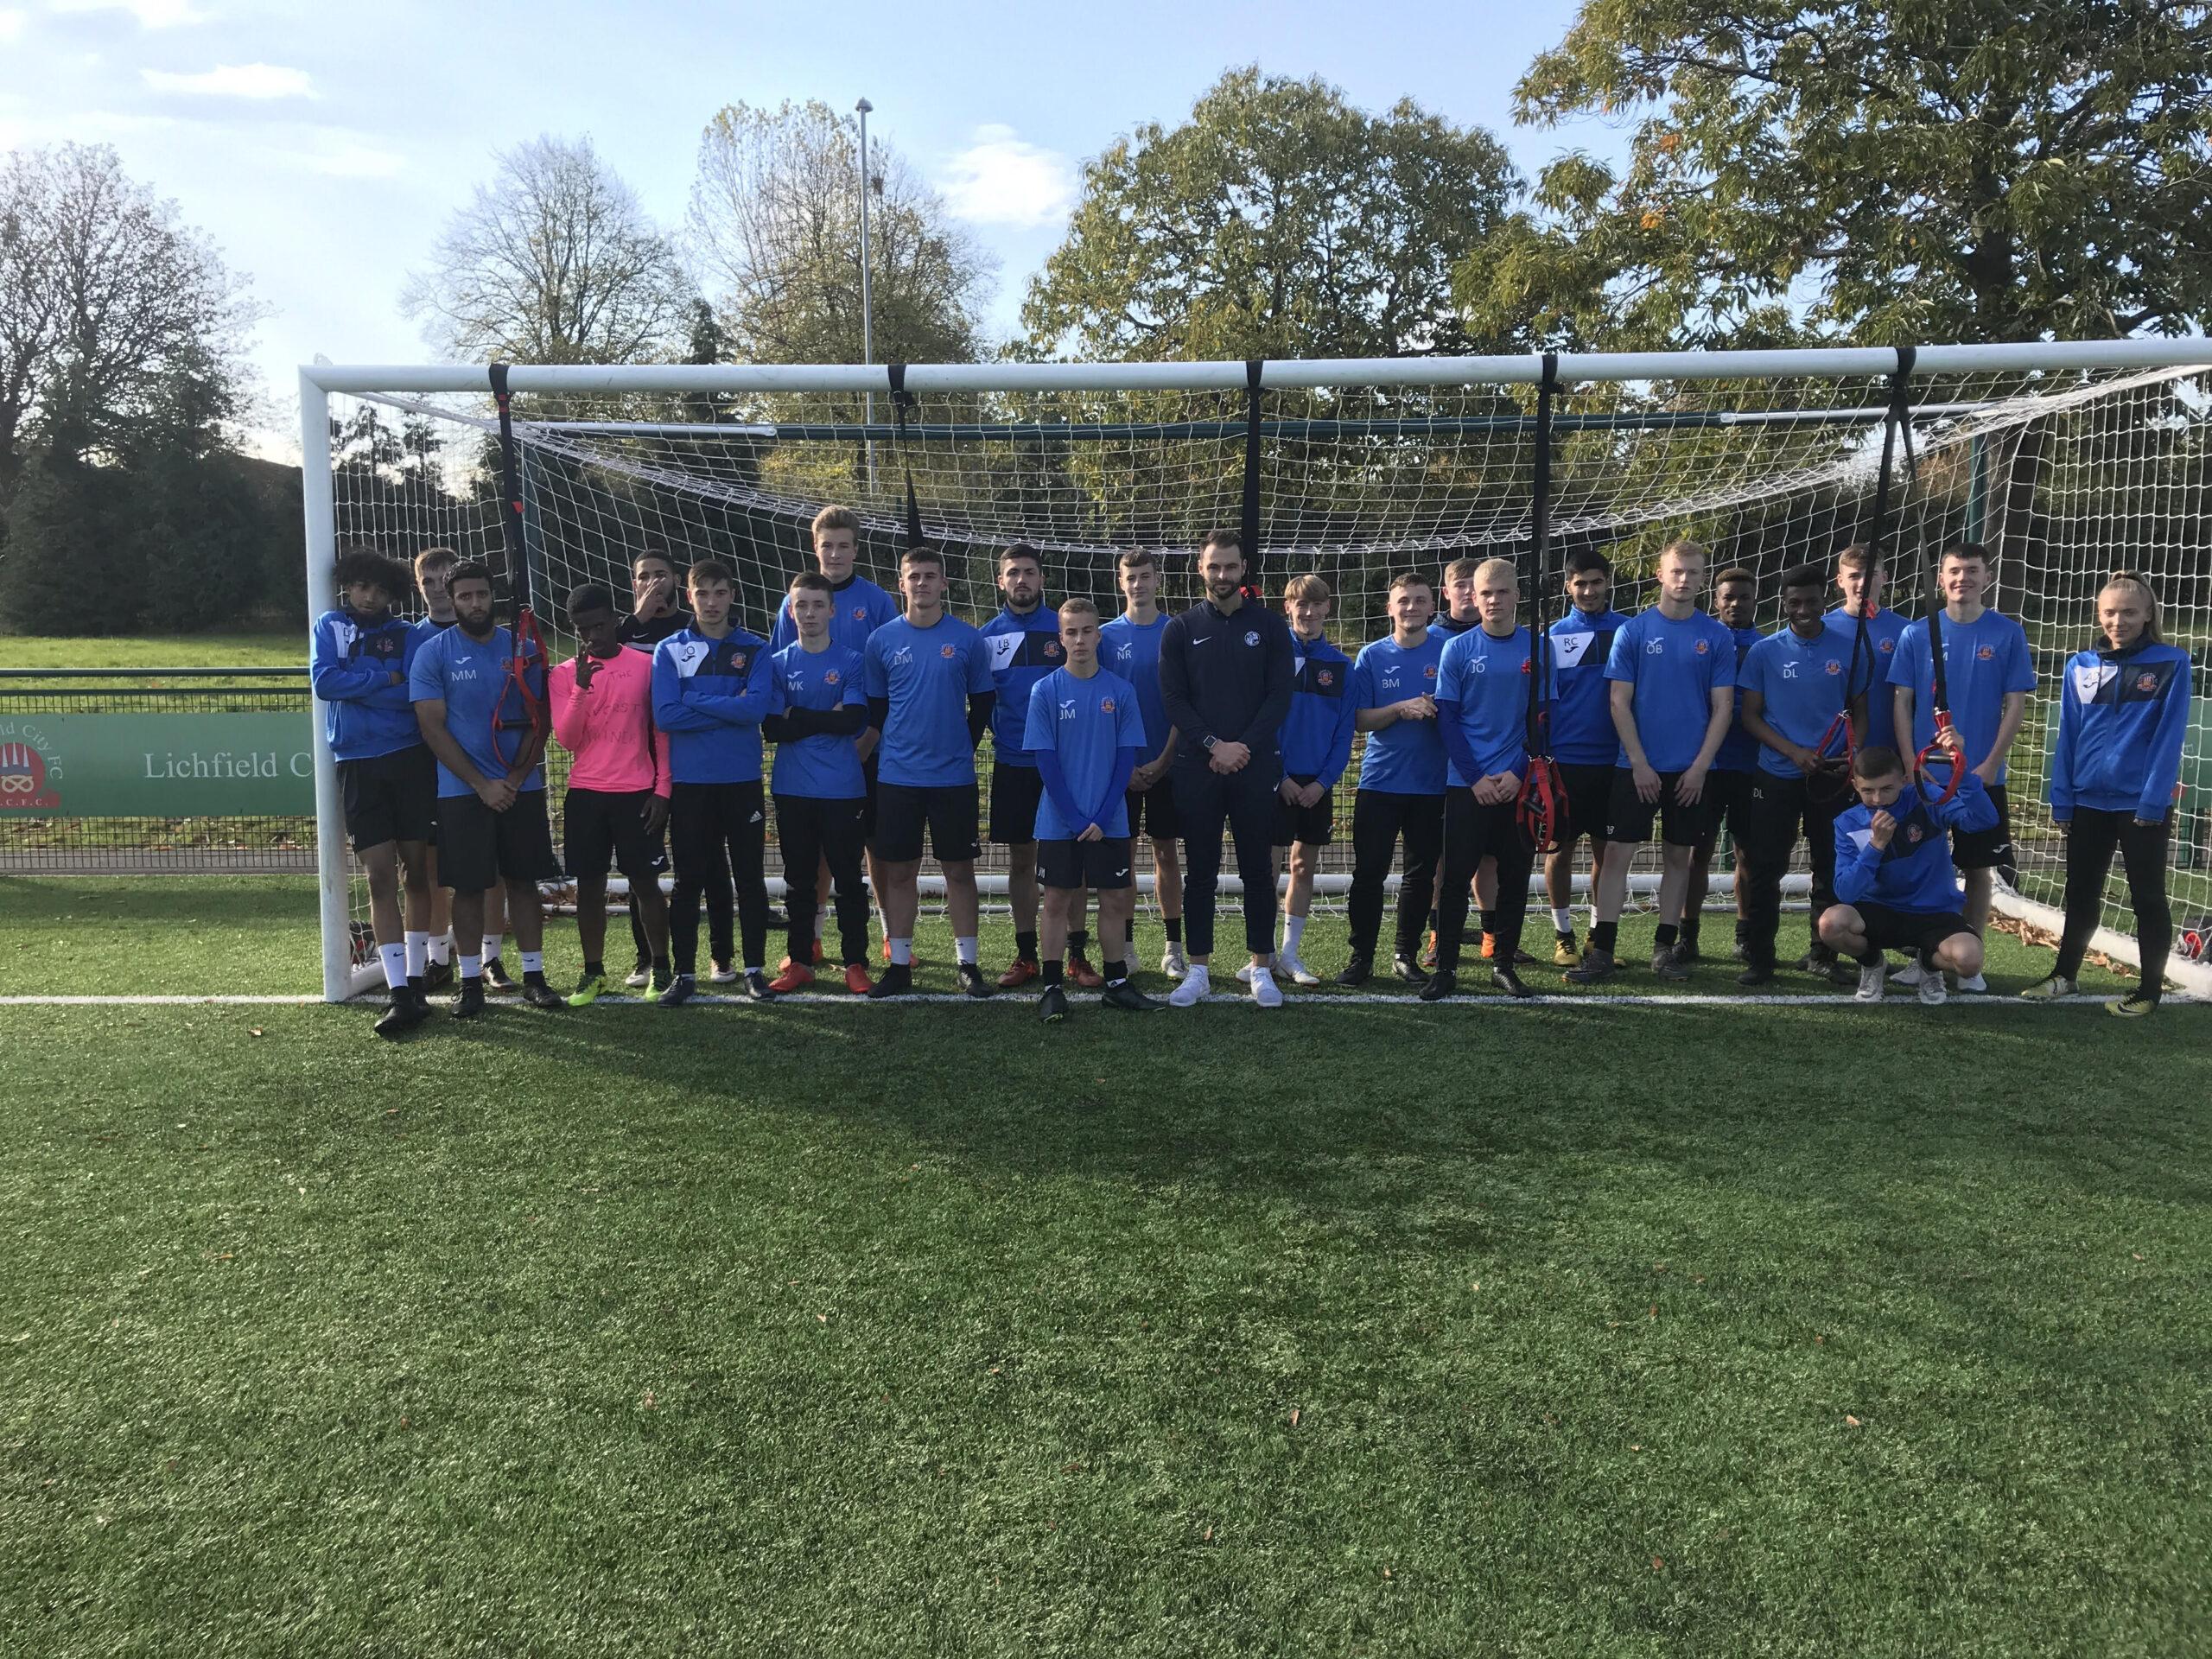 Lichfield City Academy Ballers-FUN